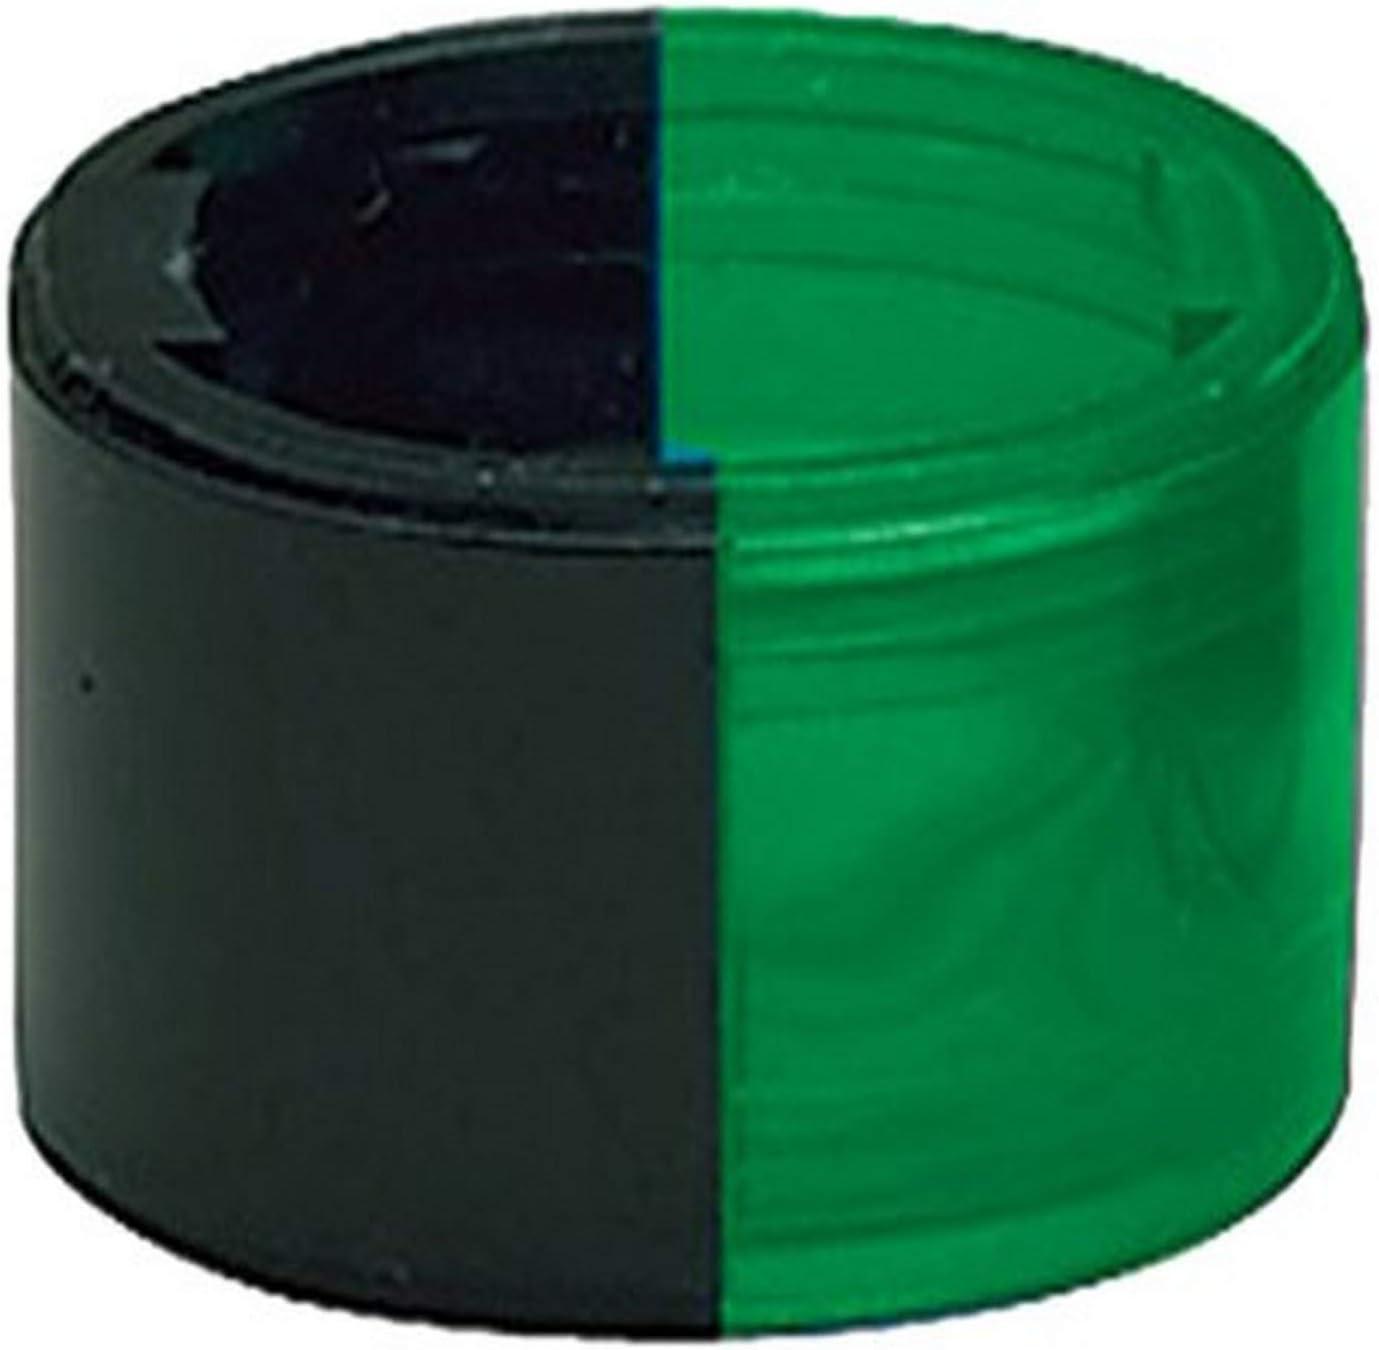 "Perko 0228DPGLNS Horizontal Mount Side Light Lens Replacement - Green, 1"" Height"